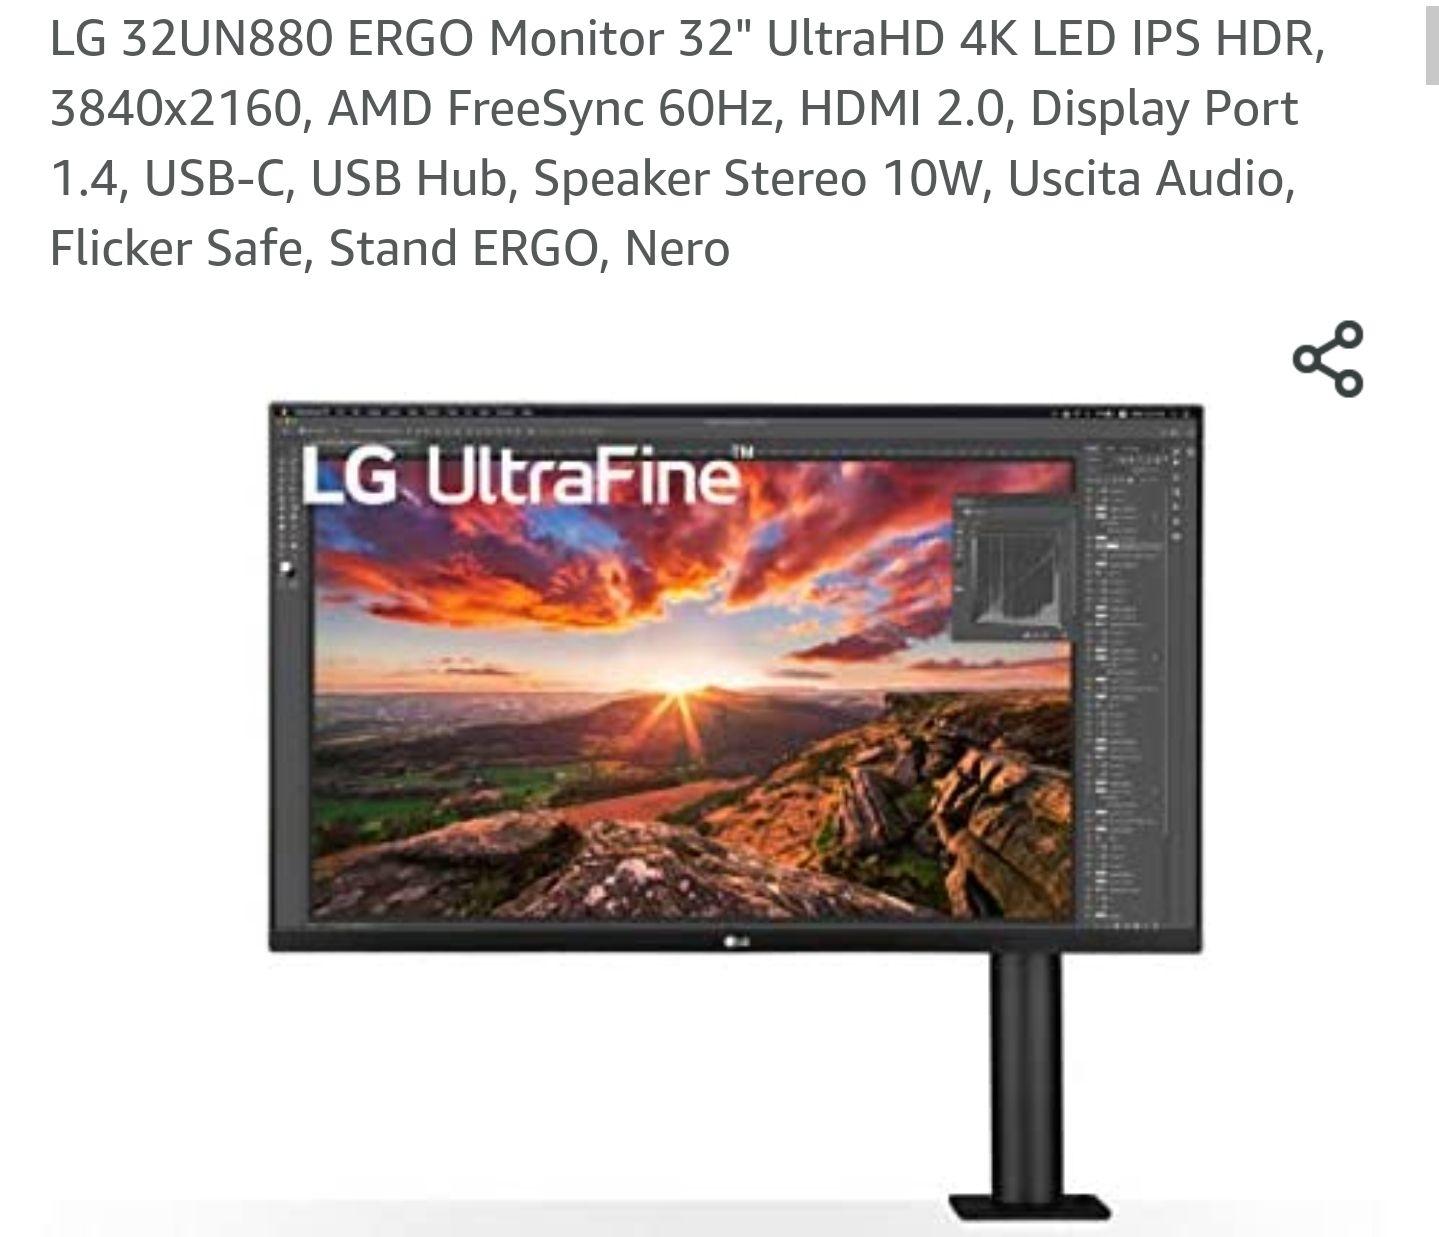 "LG 32UN880 ERGO Monitor 32"" UltraHD 4K LED IPS HDR, 3840x2160, AMD FreeSync 60Hz, HDMI 2.0, Display Port 1.4, USB-C"